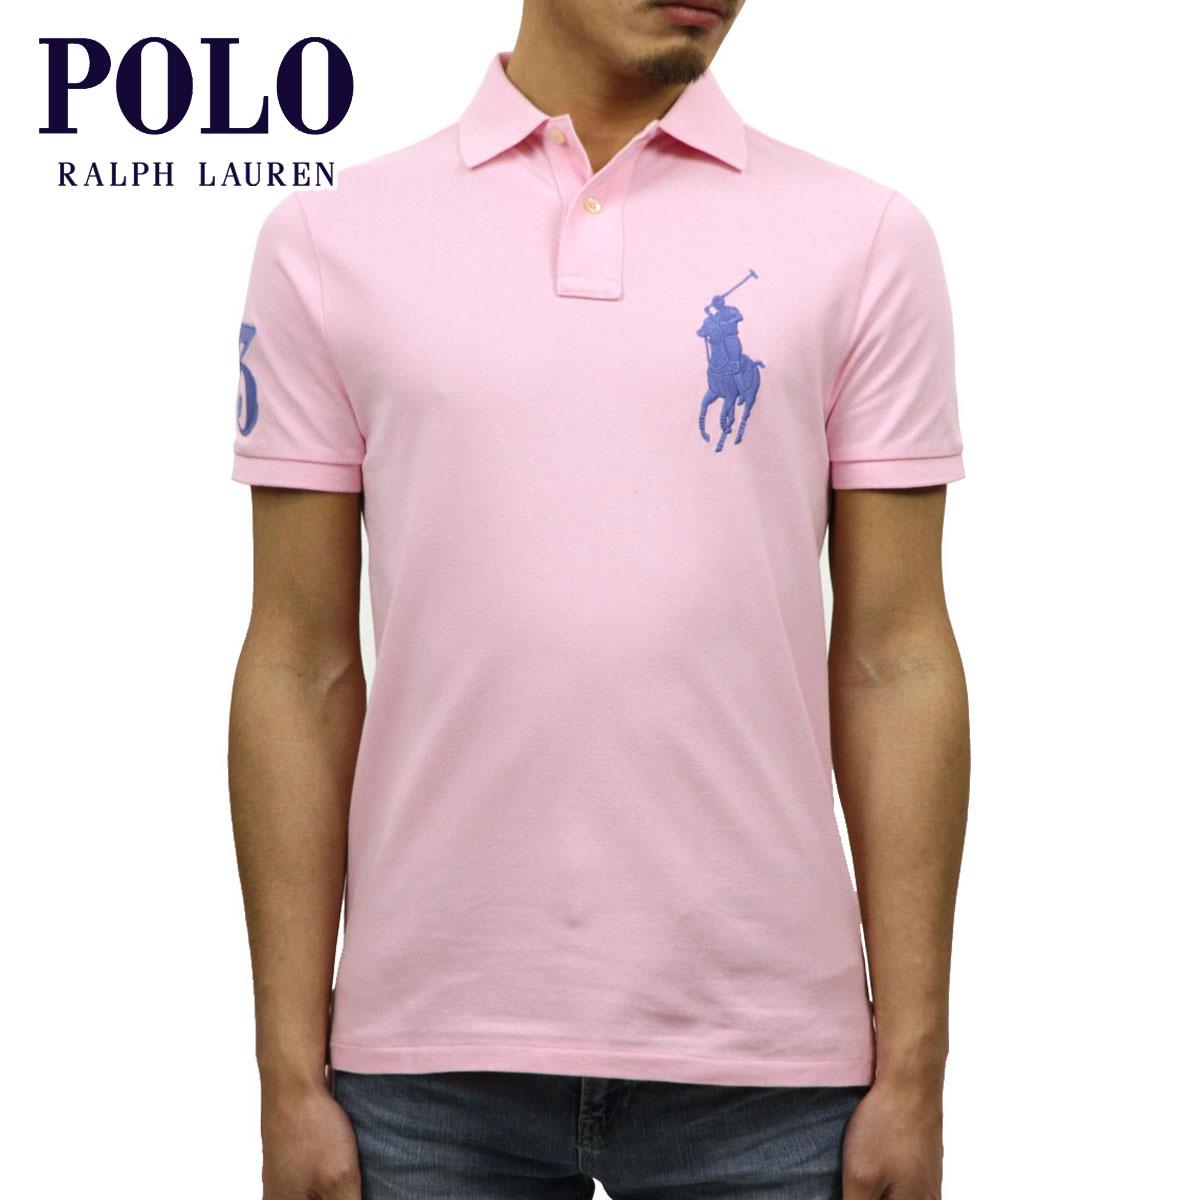 d6fd72de1e Polo Ralph Lauren POLO RALPH LAUREN regular article men big pony short  sleeves polo shirt BIG PONY CUSTOM SLIM FIT COTTON MESH POLO